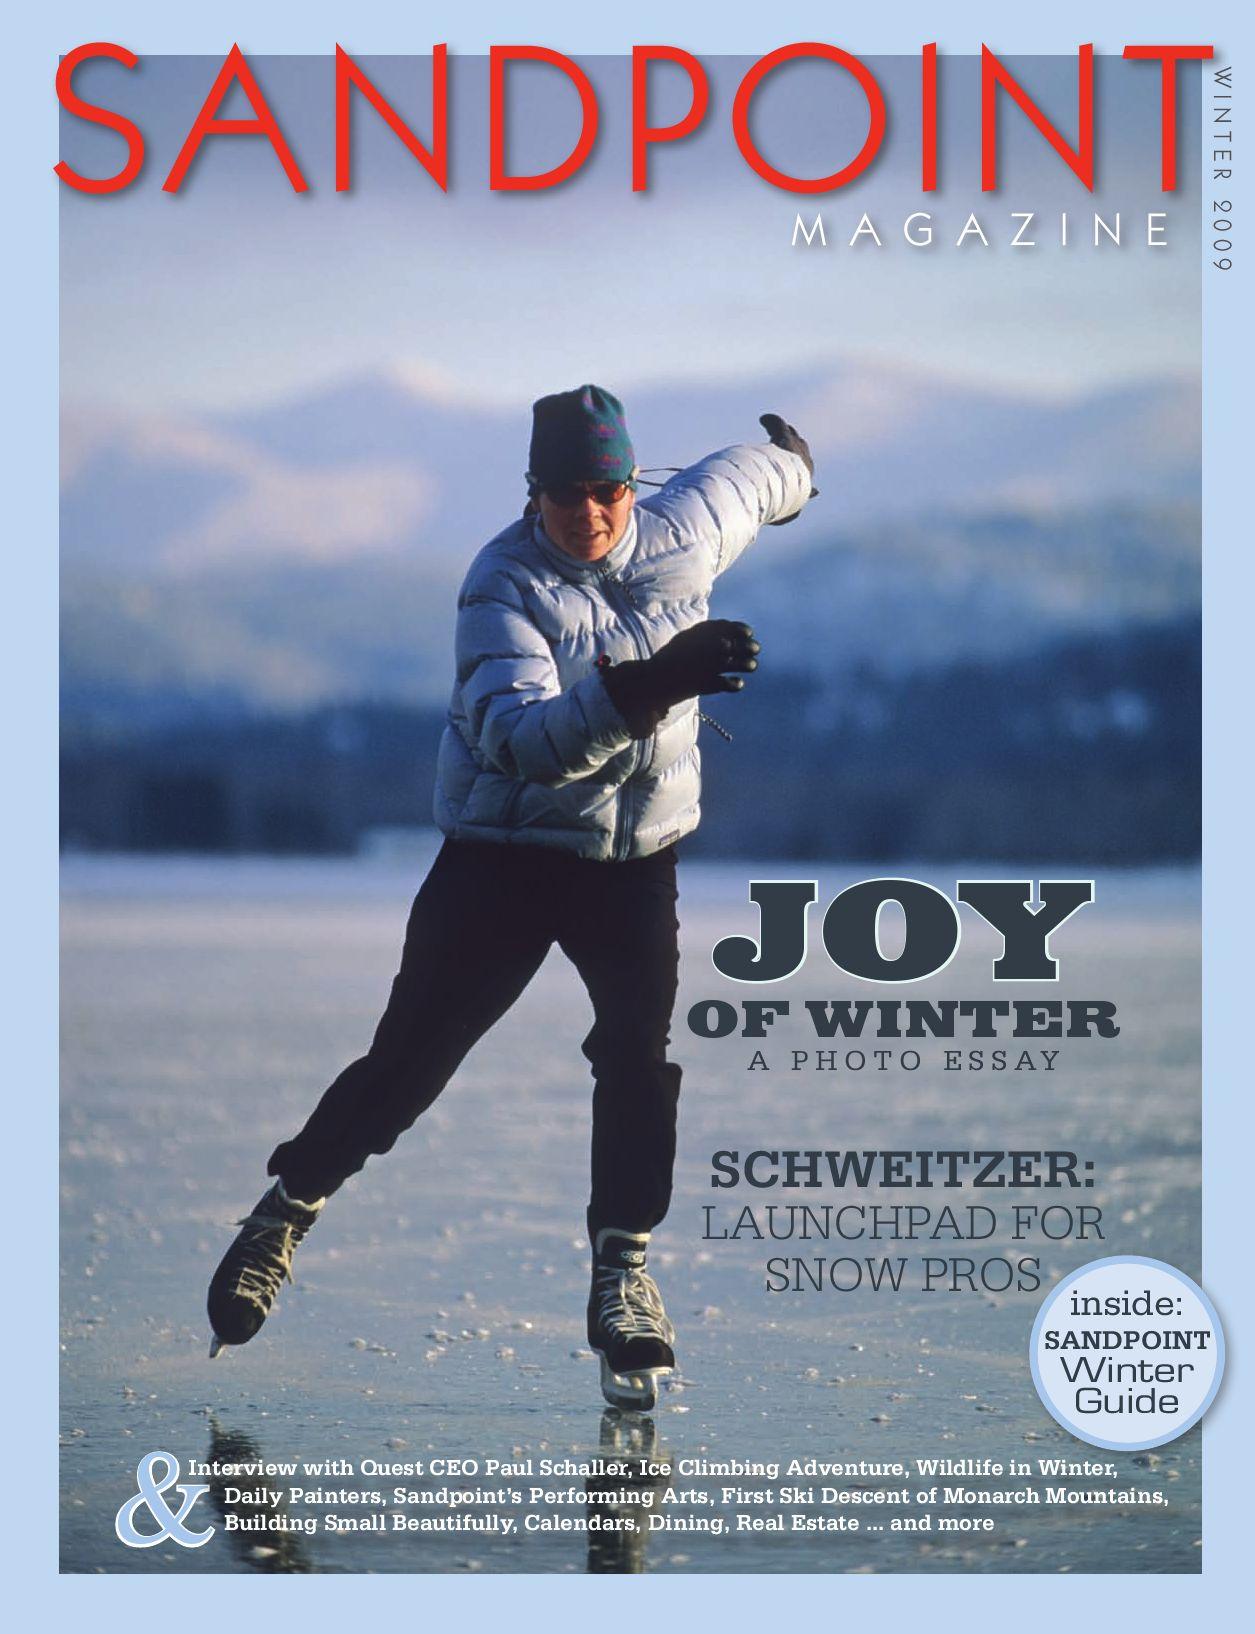 Sandpoint Magazine Winter 2009 by Keokee    media + marketing - issuu b54e7474486